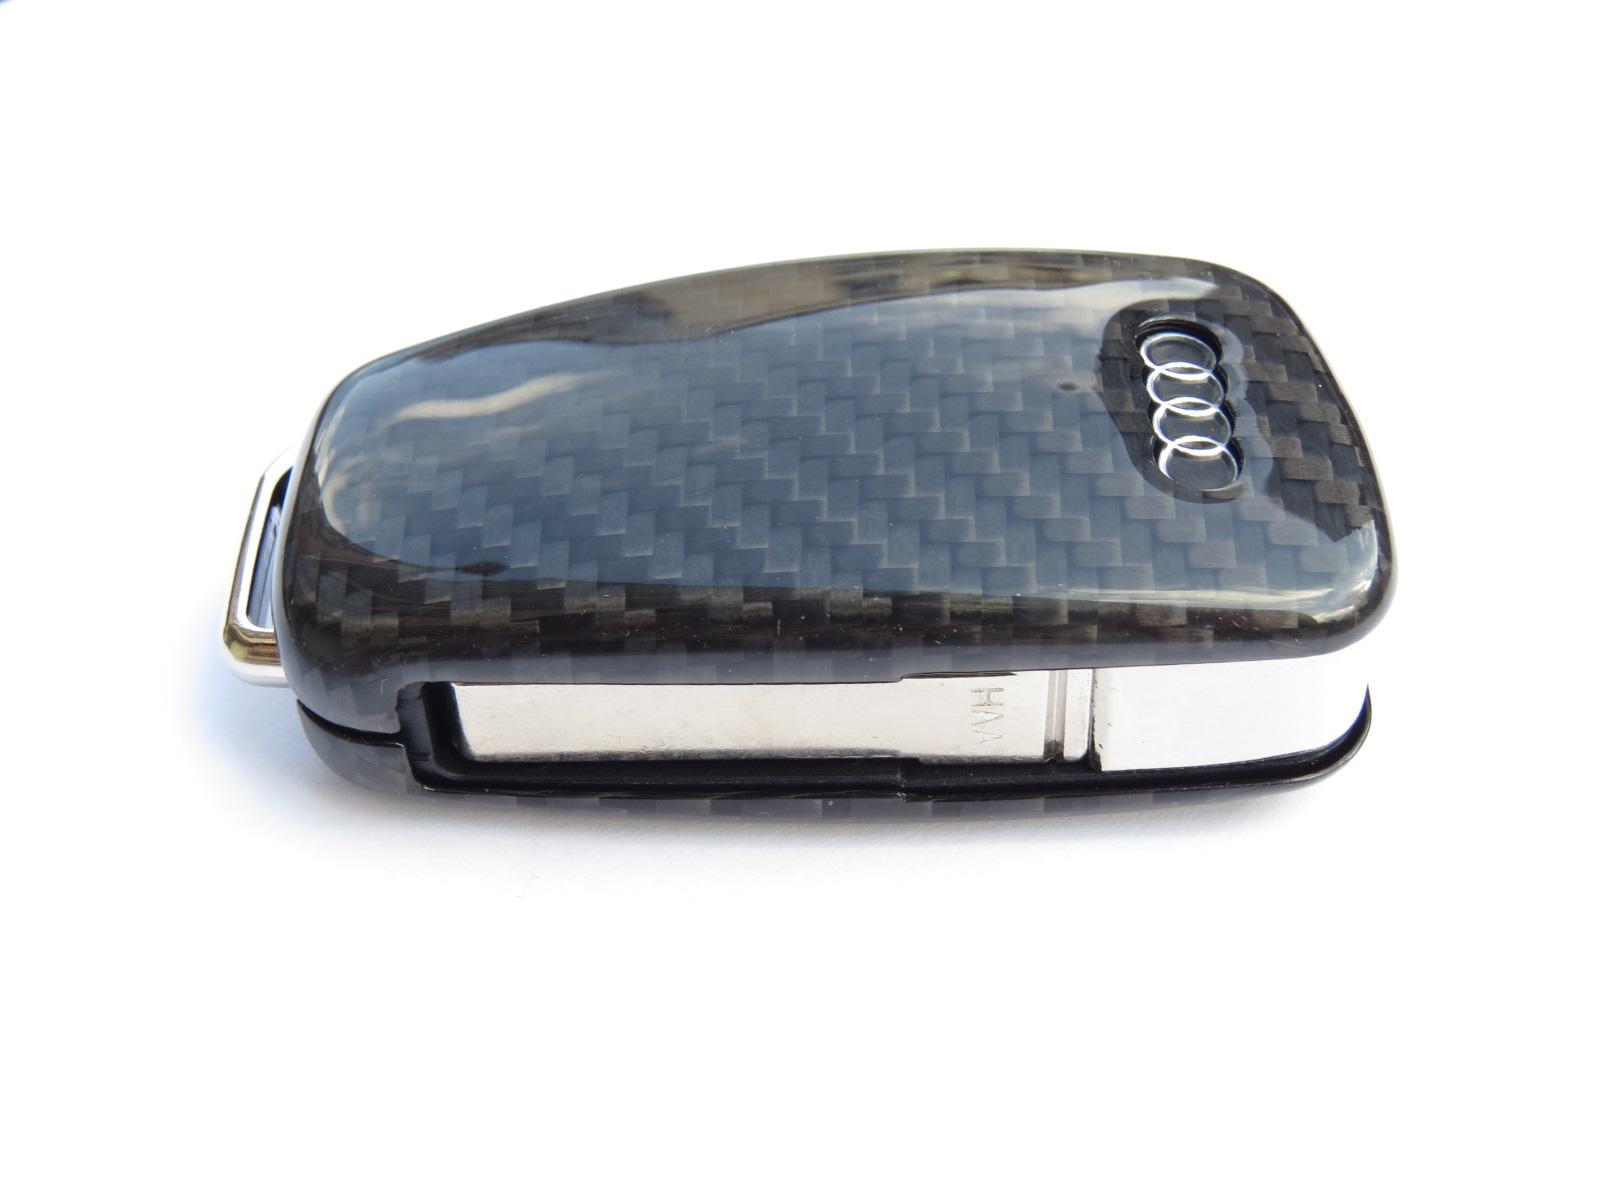 pinalloy carbon fiber schl ssel cover h lle key case fall. Black Bedroom Furniture Sets. Home Design Ideas